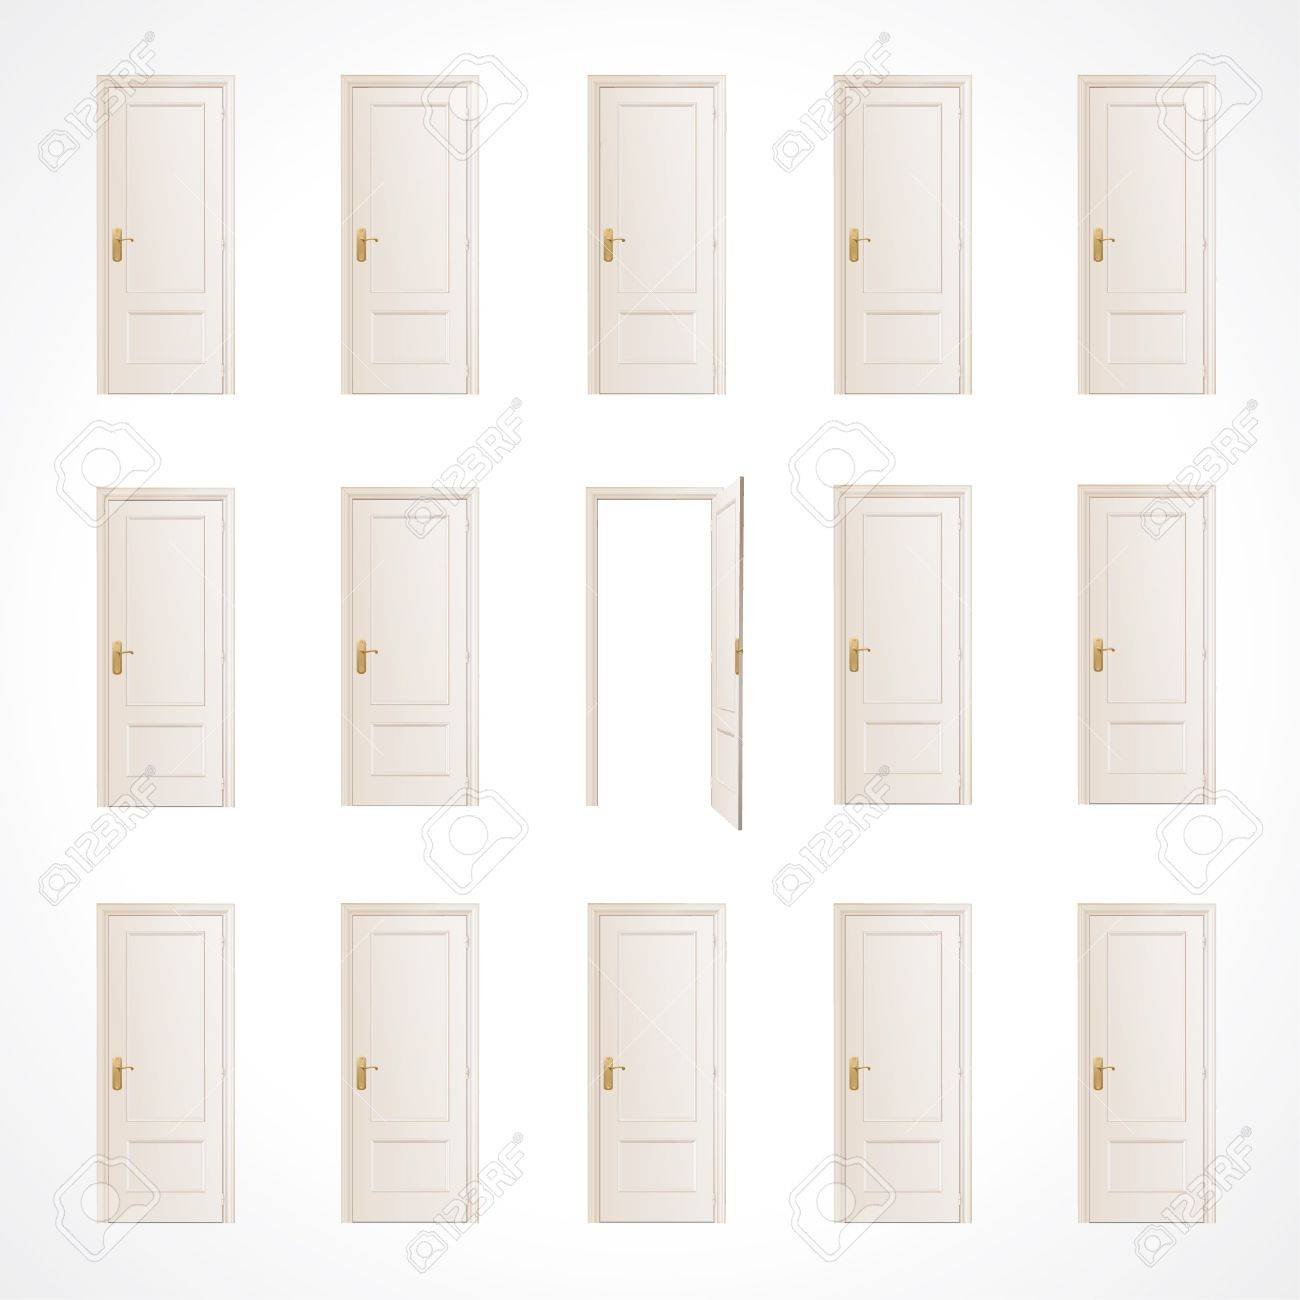 Lot of white doors and one open  Vector design Stock Vector - 17265526